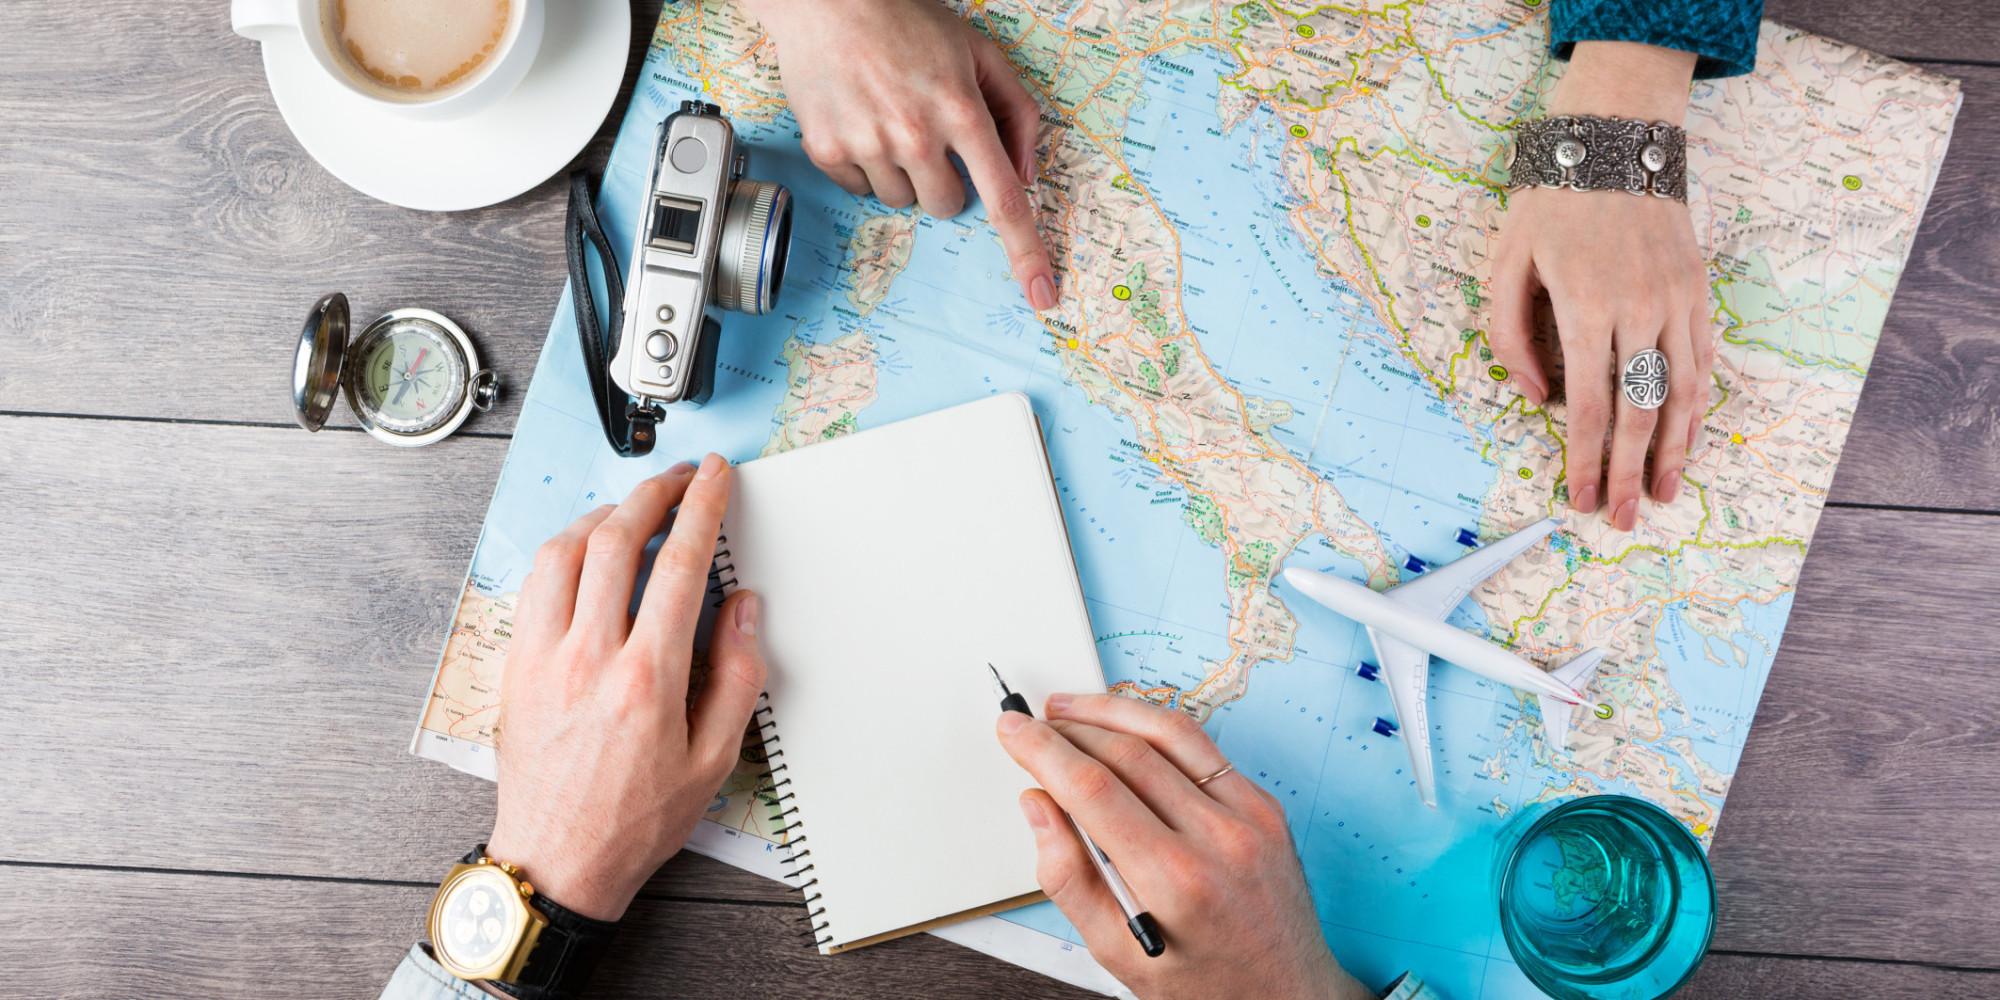 We're Losing the Wonder of Travel